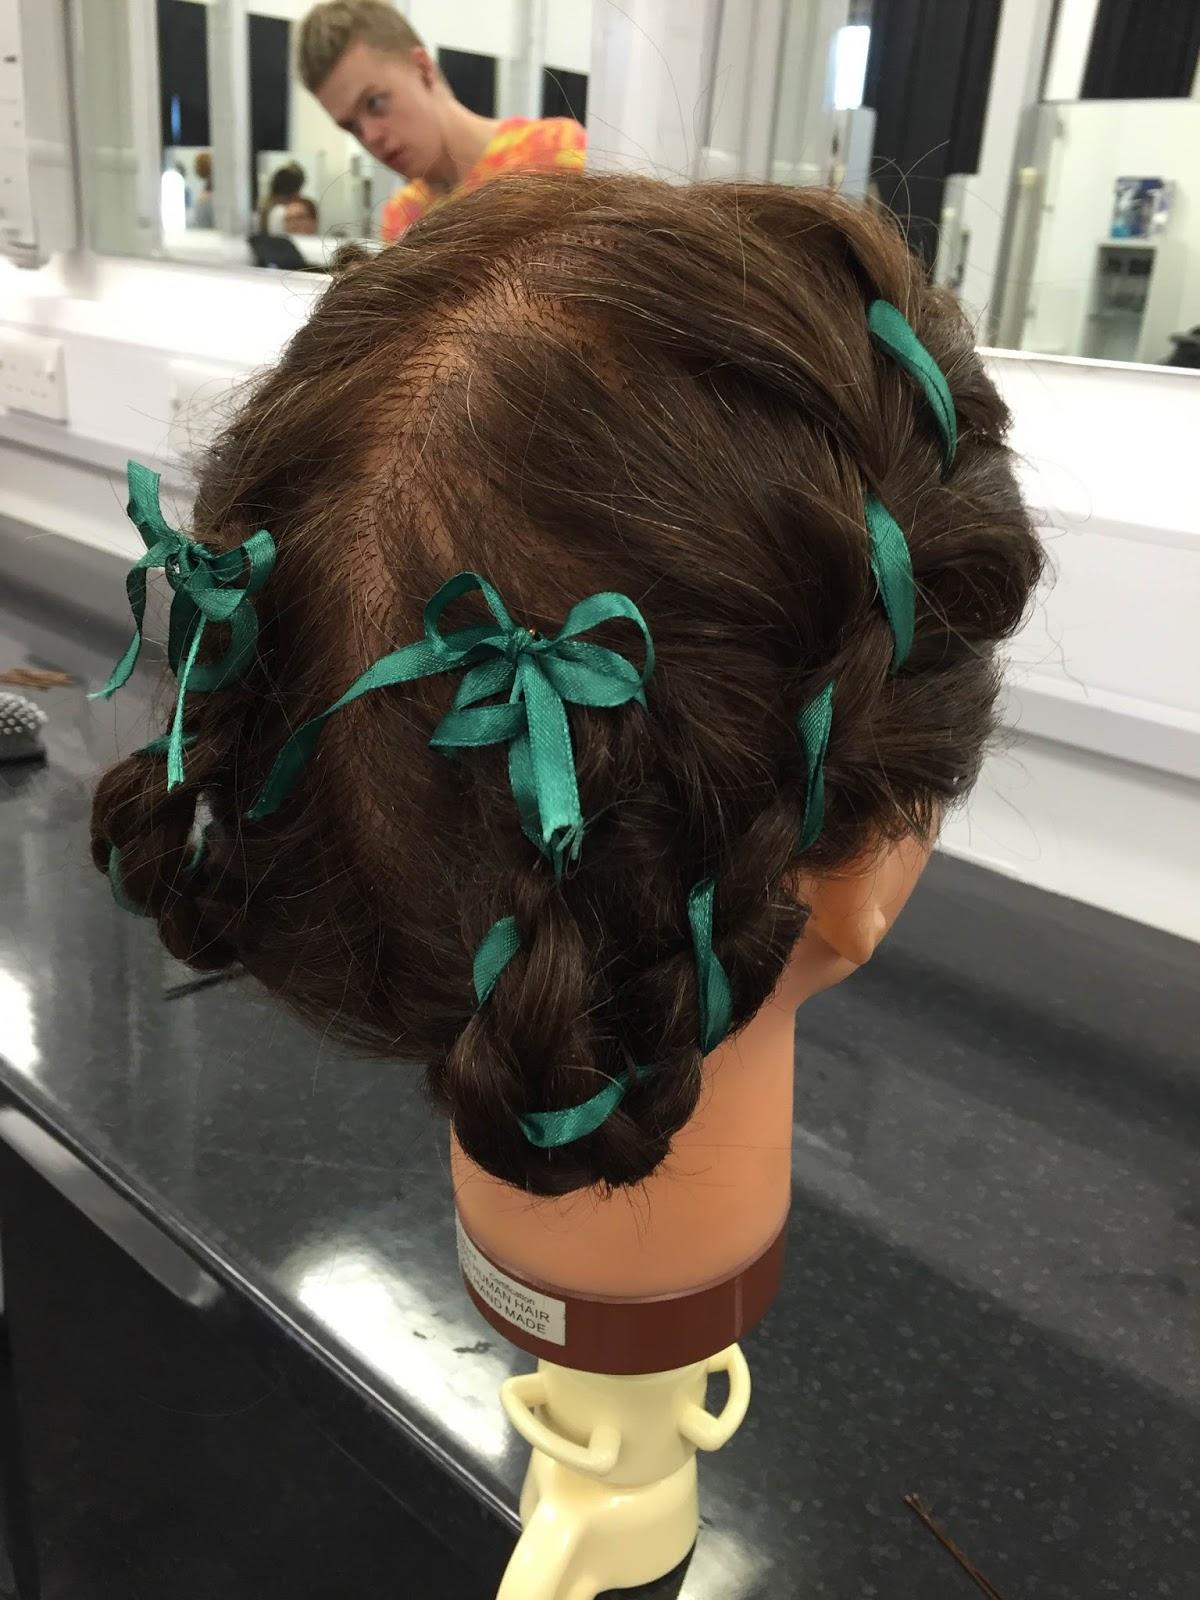 Fms407kupetytezredheadsandroyalty Elizabethan Hairstyles